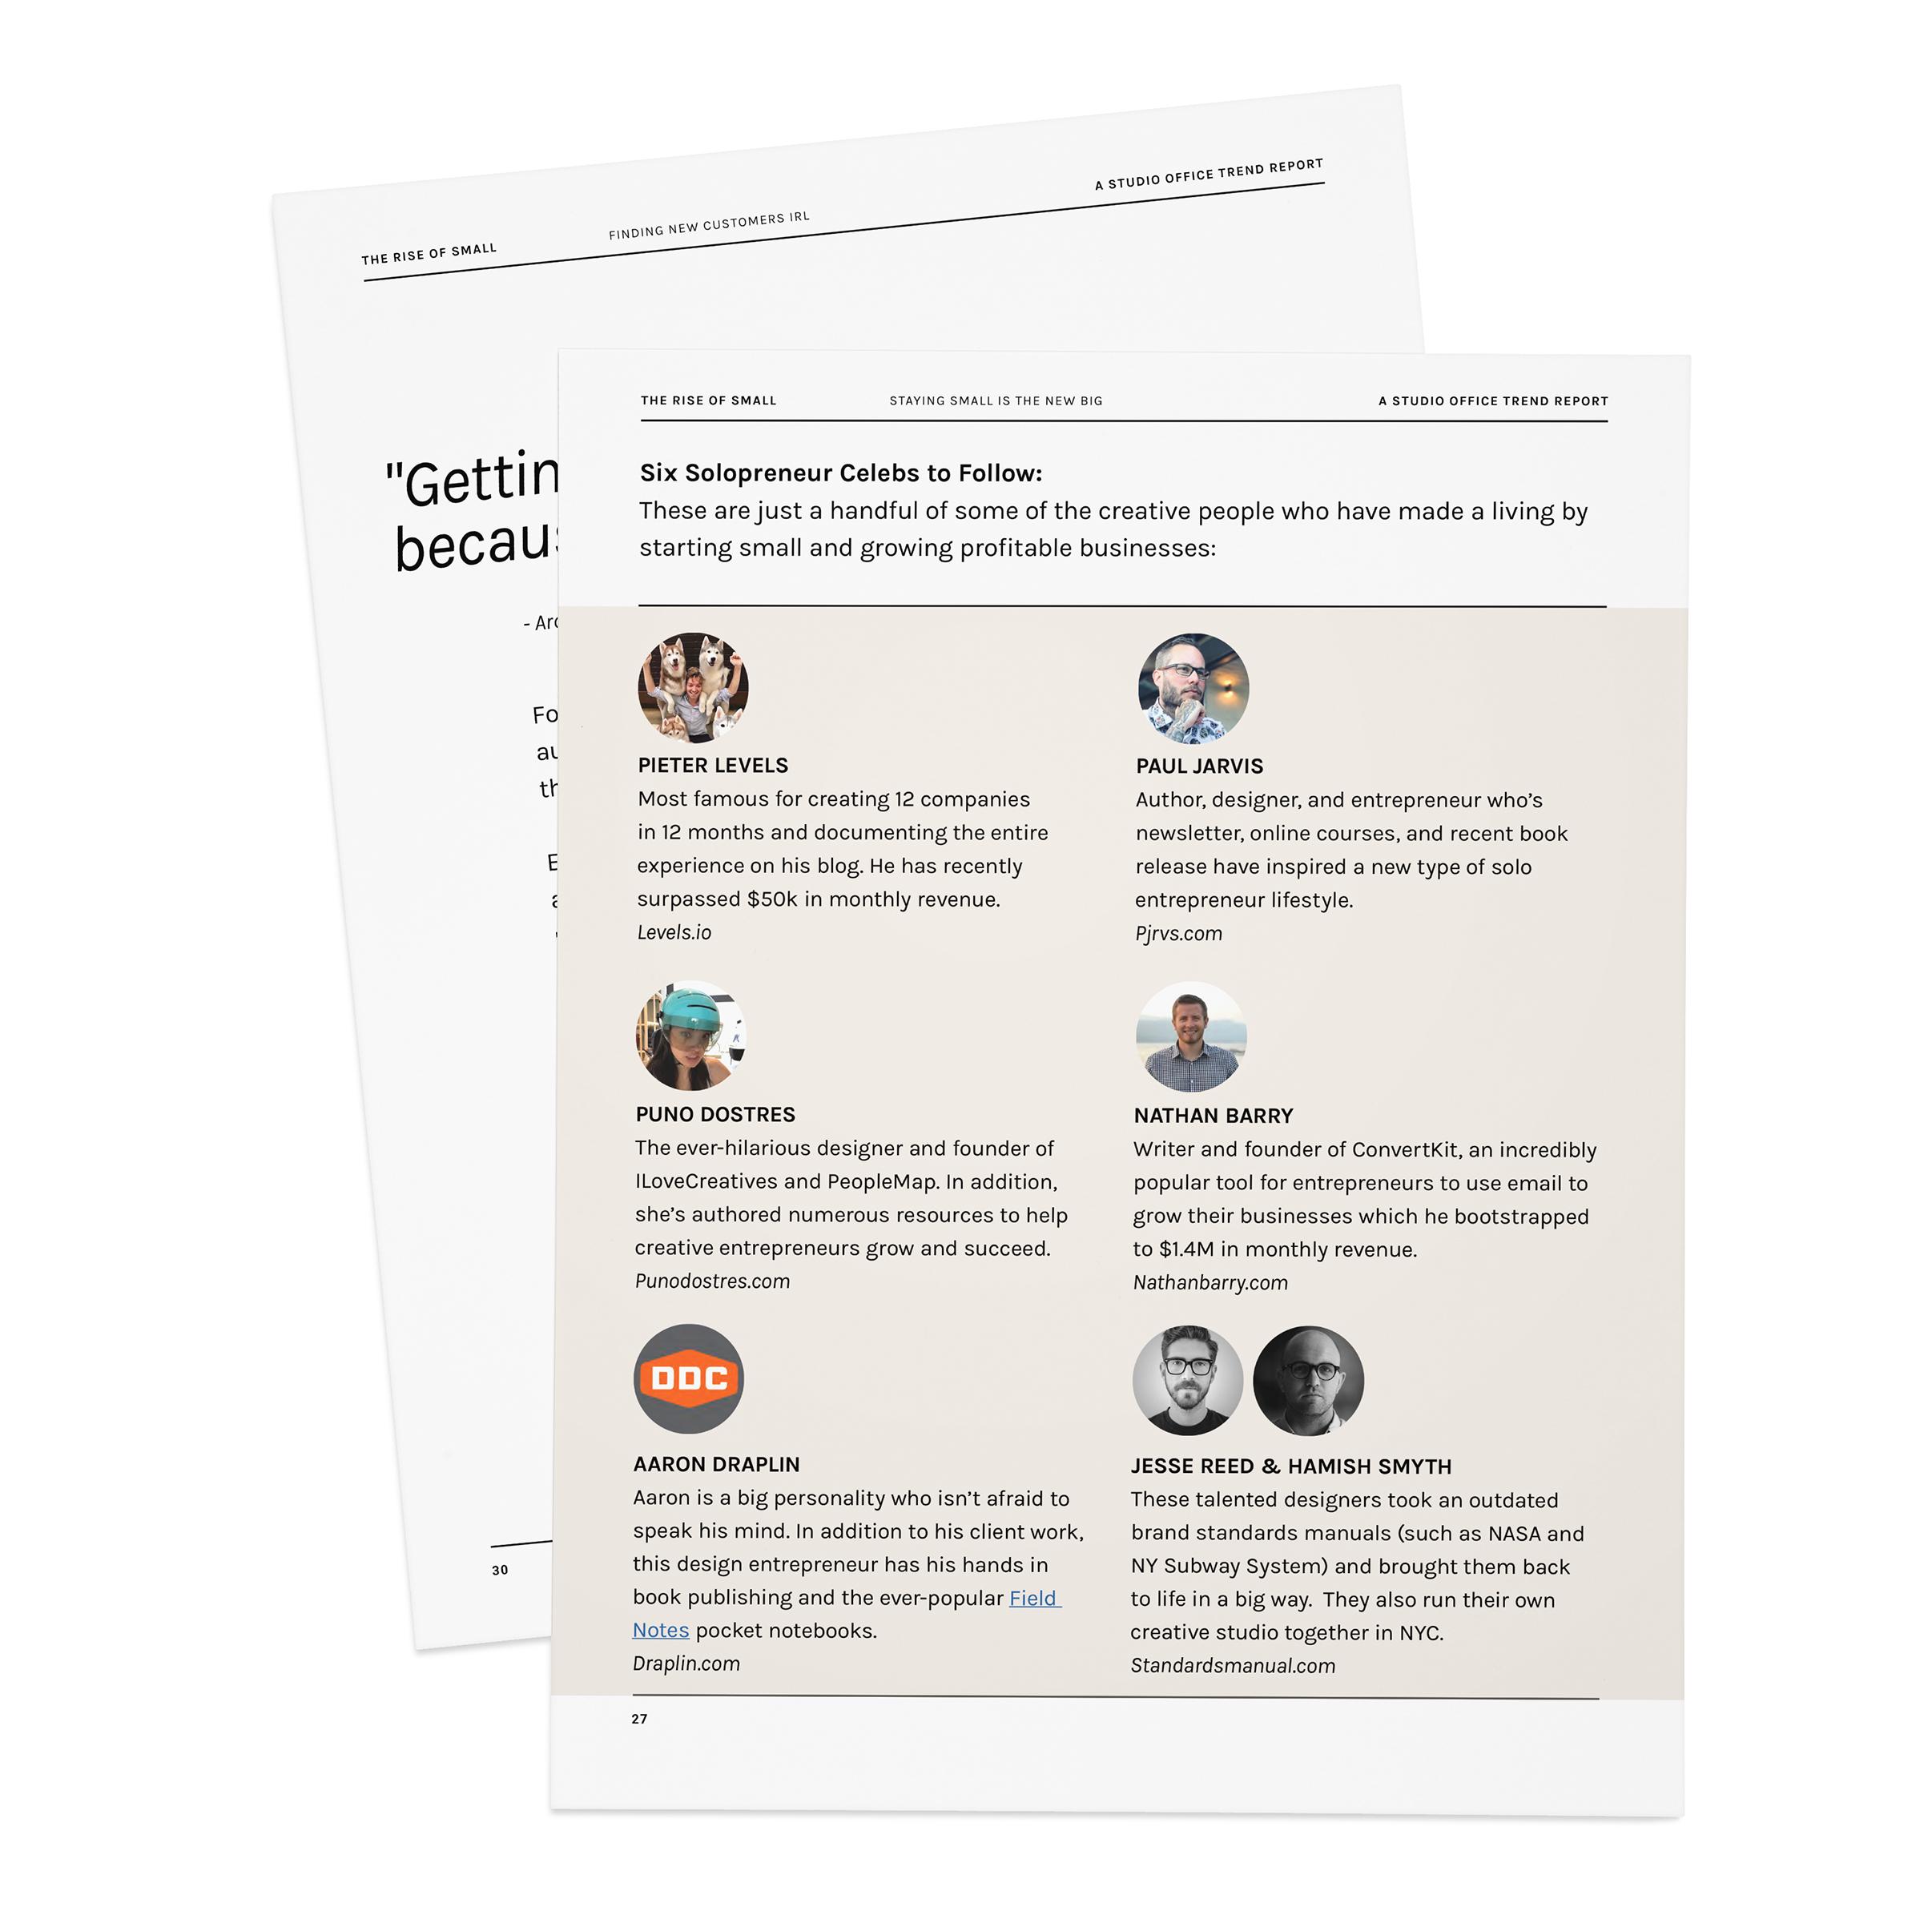 Creative-Entrepreneurship-Report-Studio-Office-Drew-Downie.png